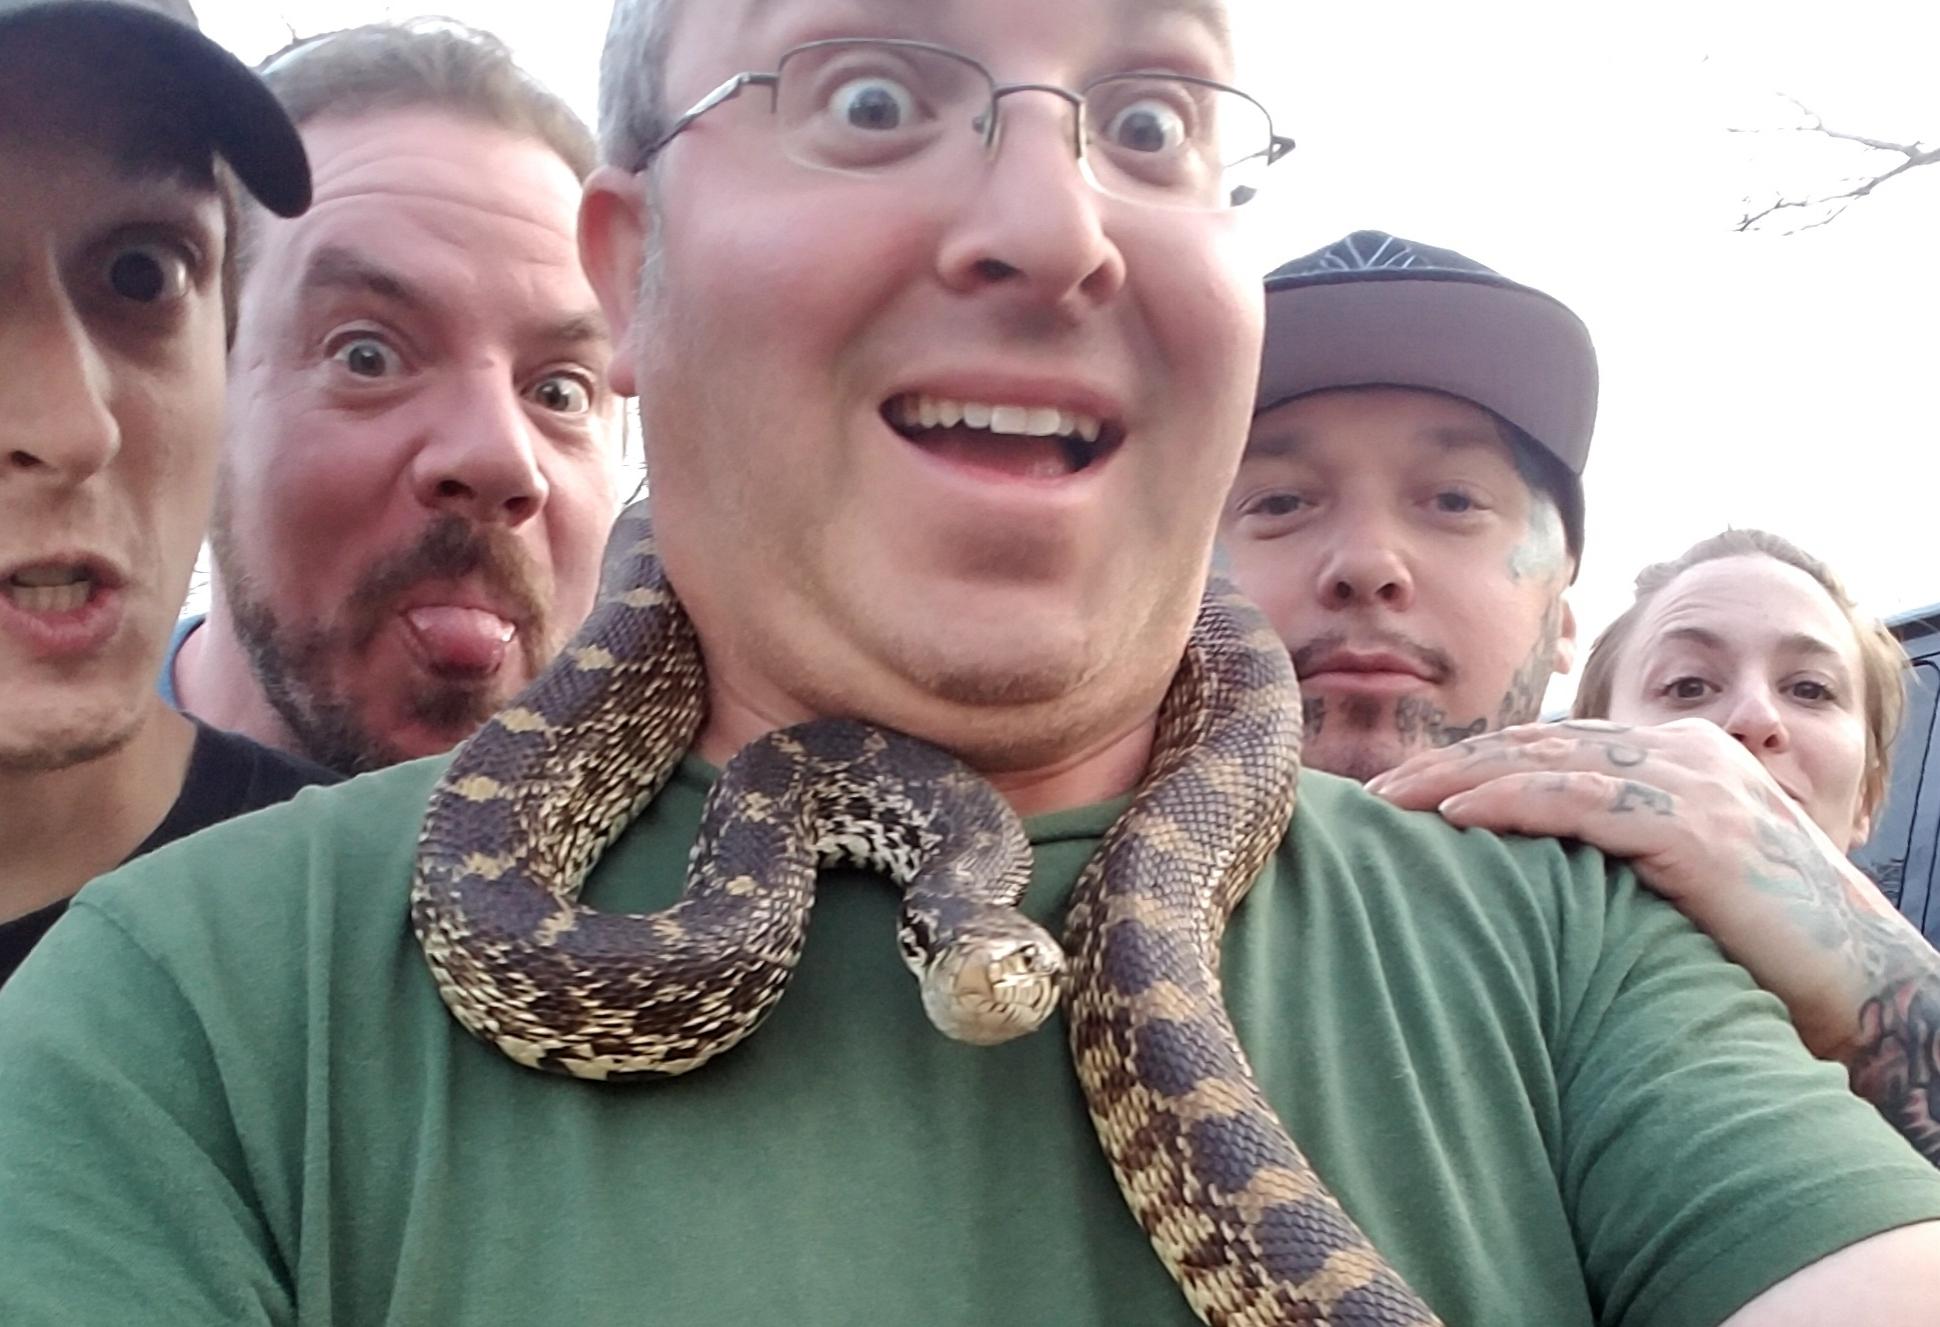 Bullsnake and the Odd Crew